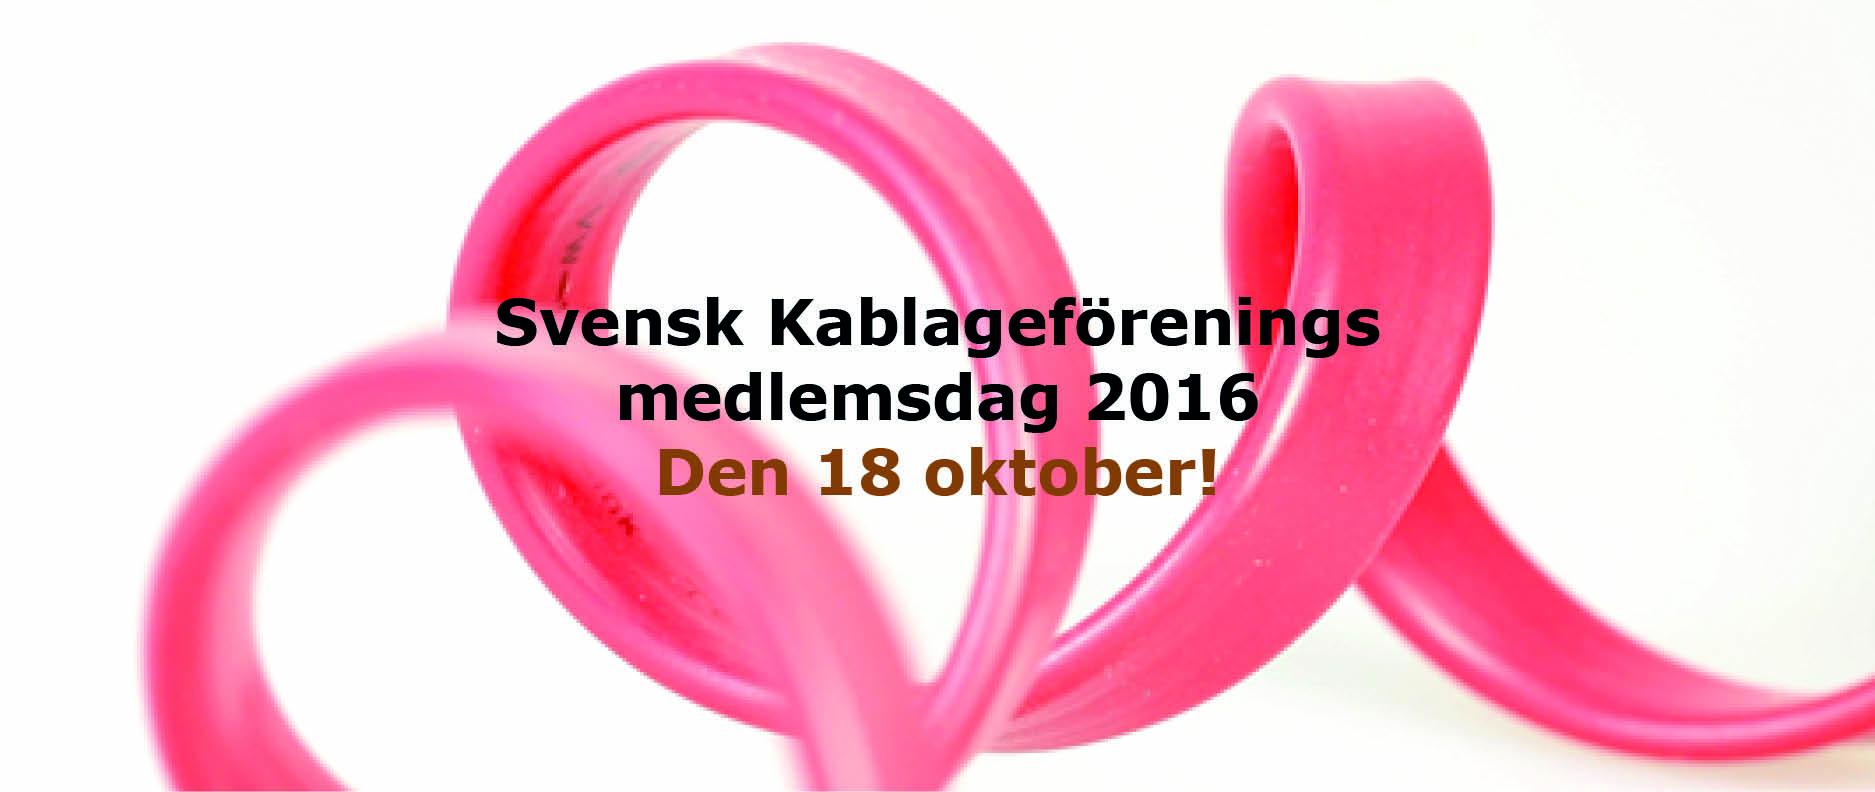 Medlemsdag 2016